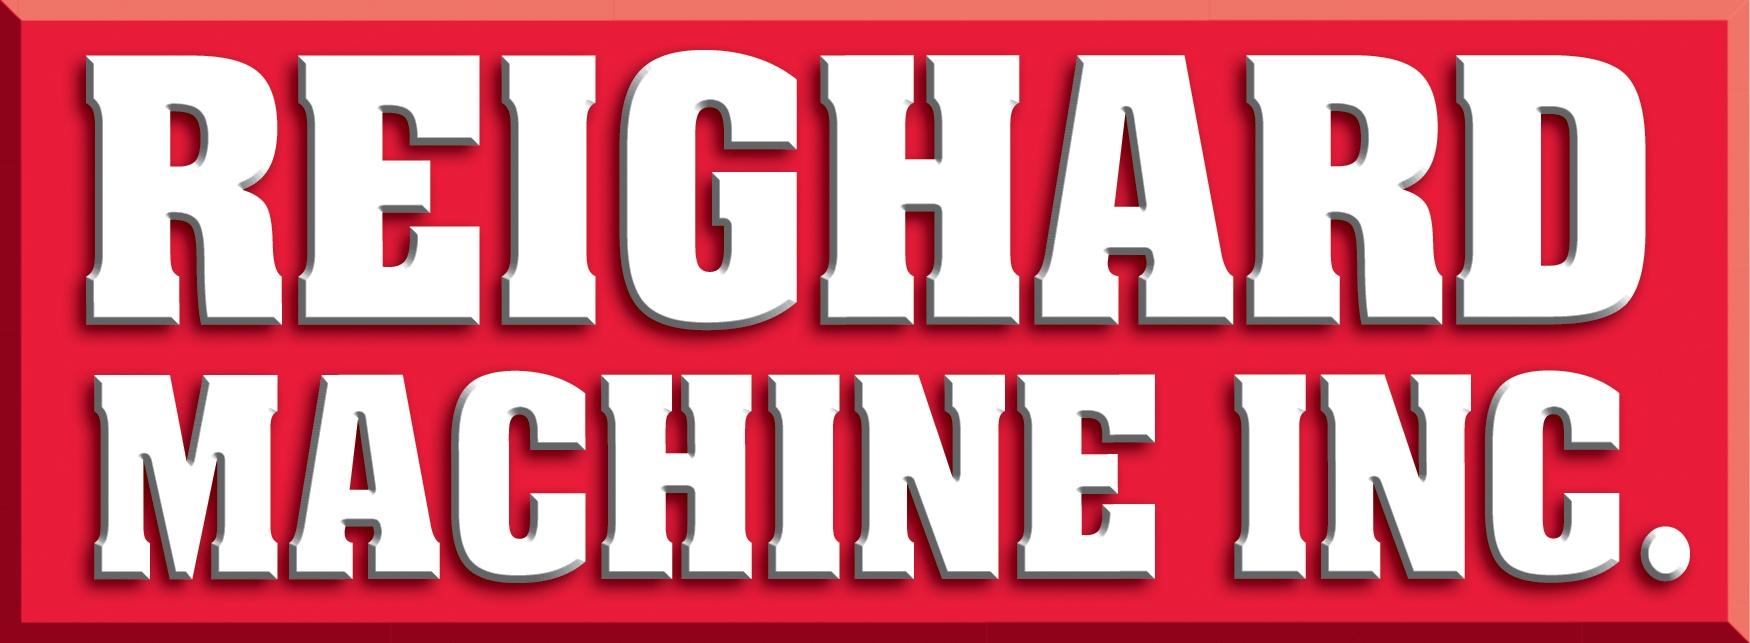 Reighard Machine Inc